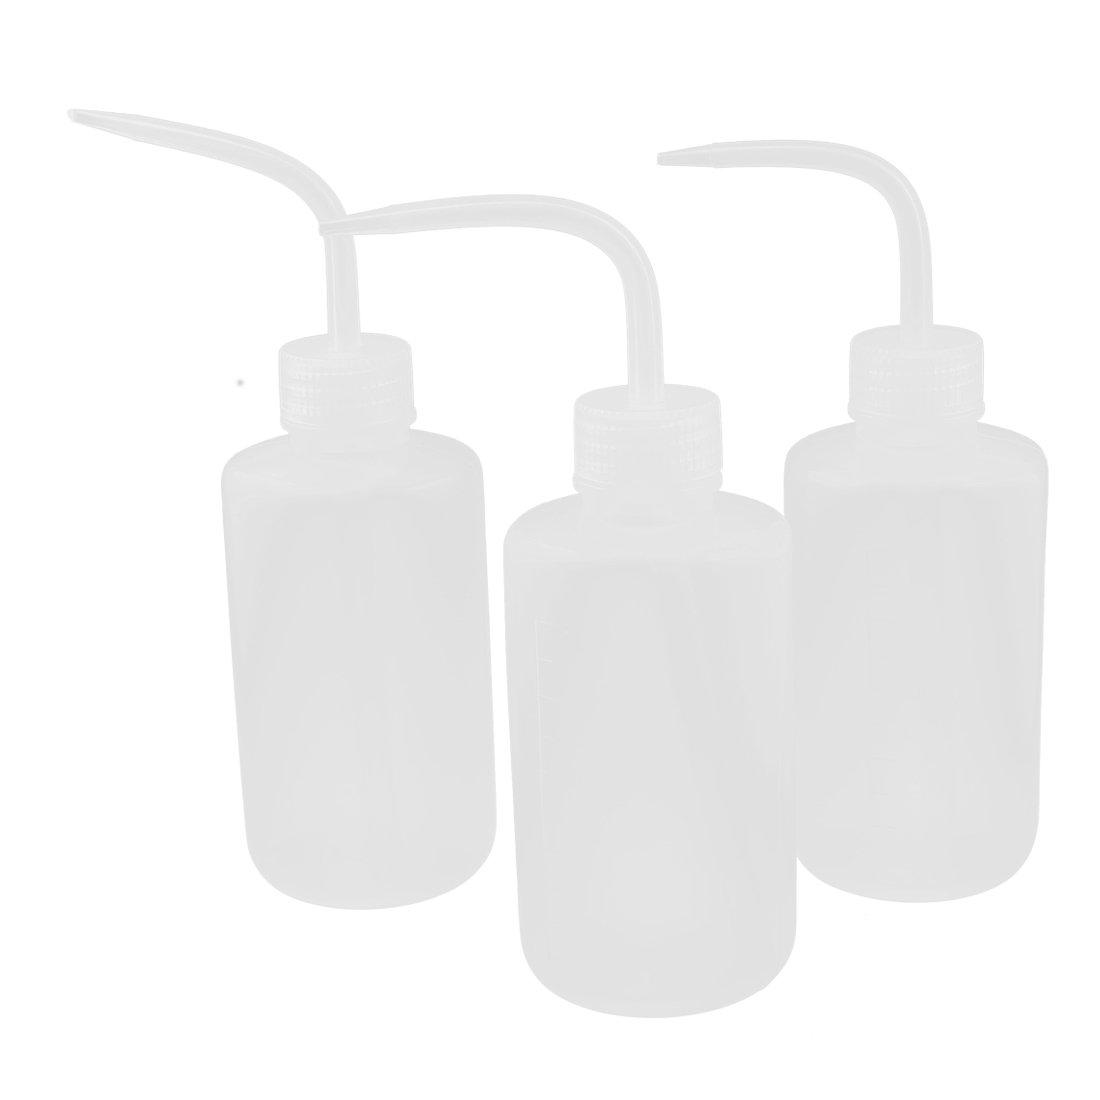 Plastic Bent Tip Oil Liquid Squeeze Bottle Dispenser 250ml 3pcs Clear uxcell a16010500ux0866